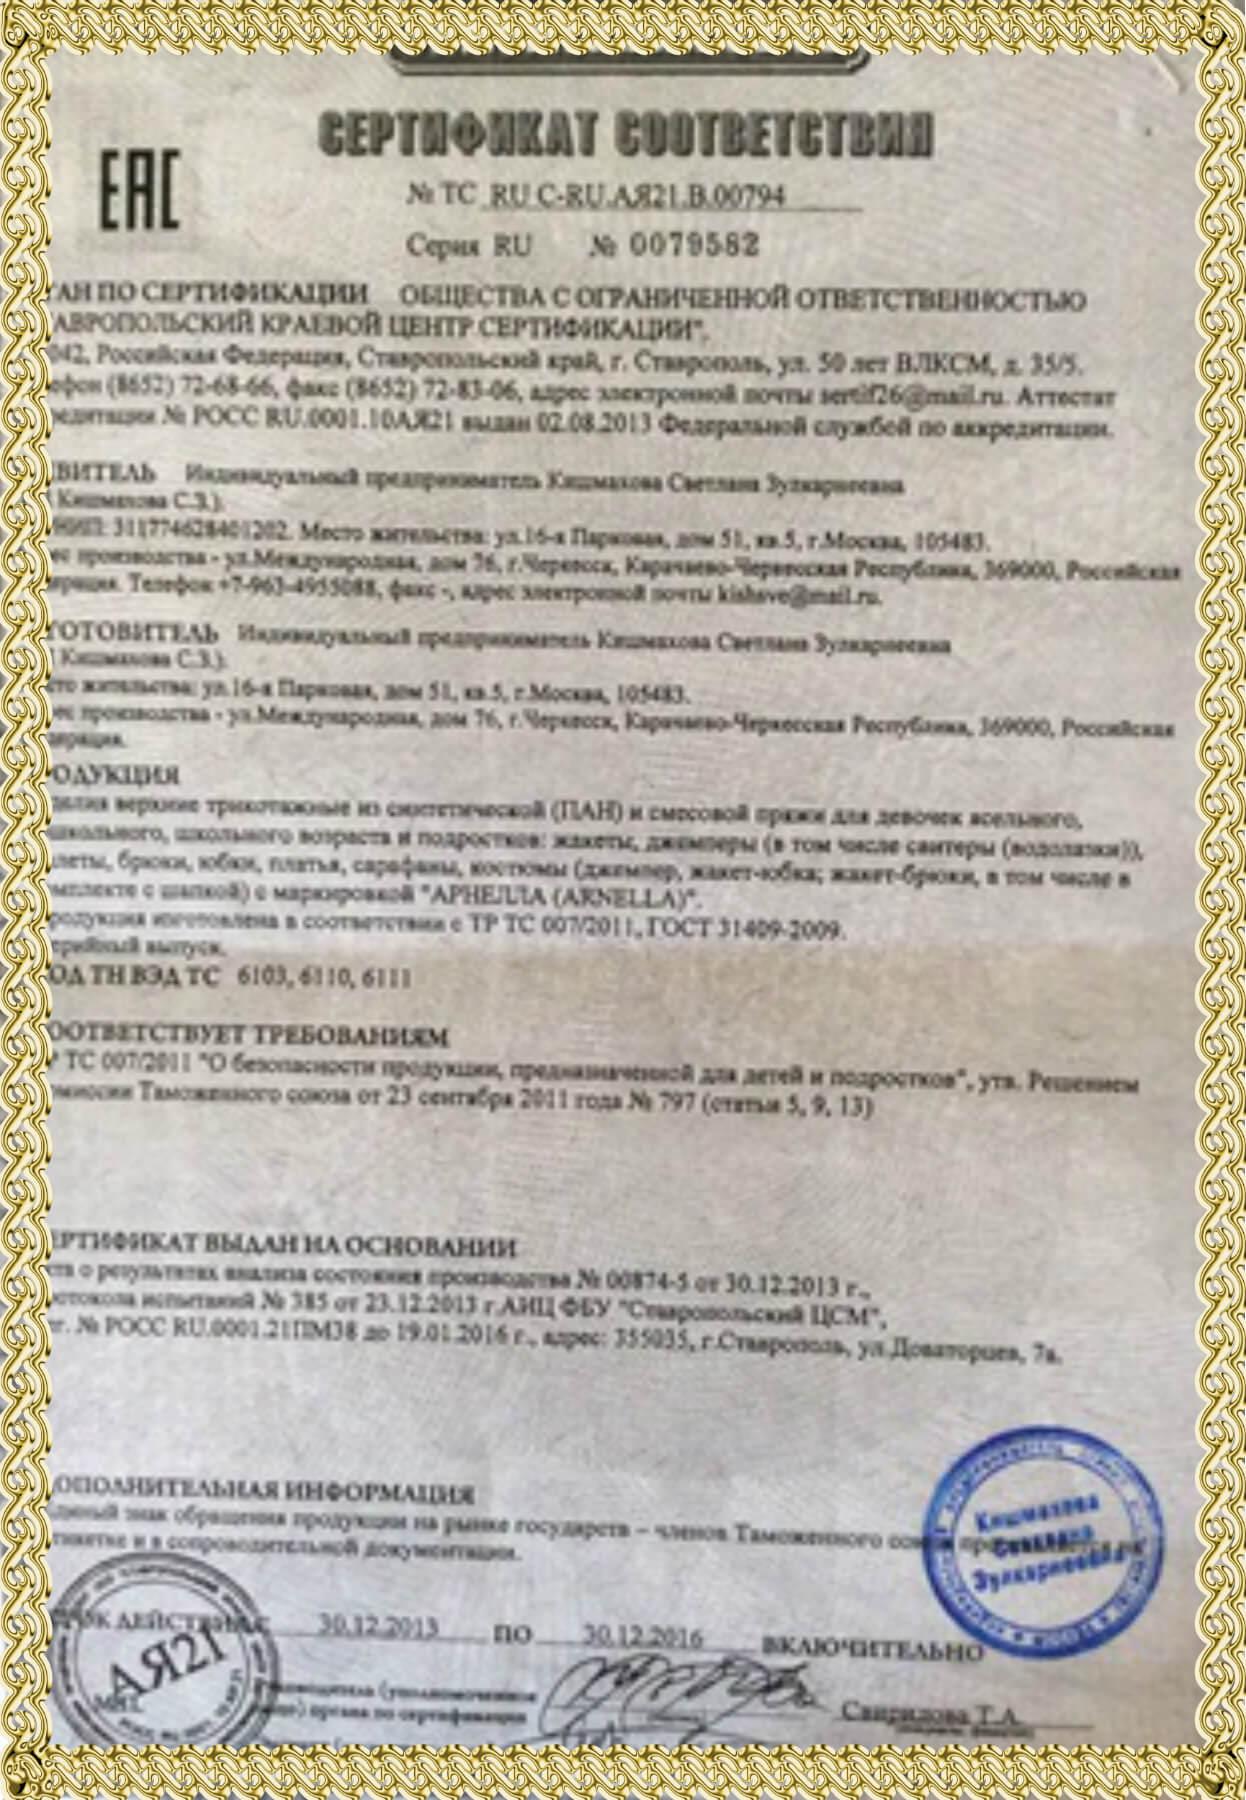 sertificat_kachestva8-__1_.jpg